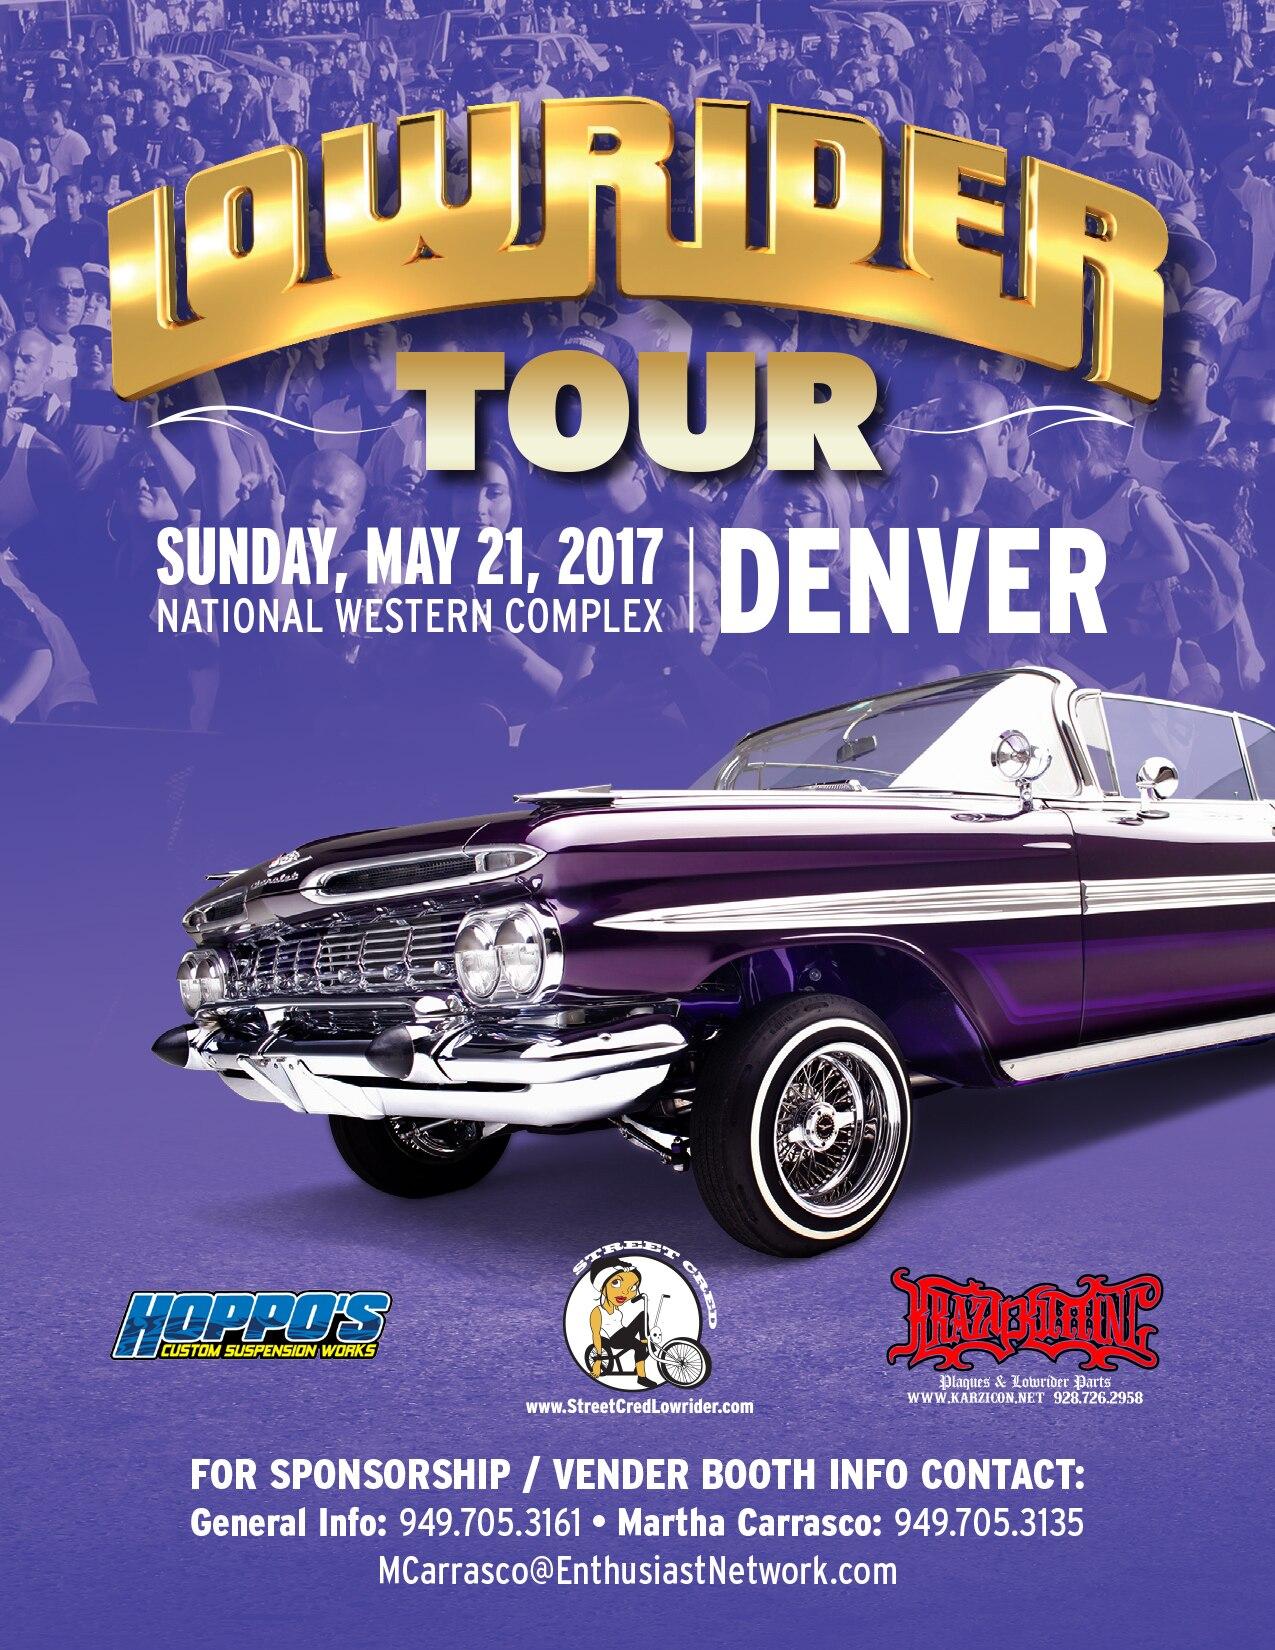 lowrider tour dever promo